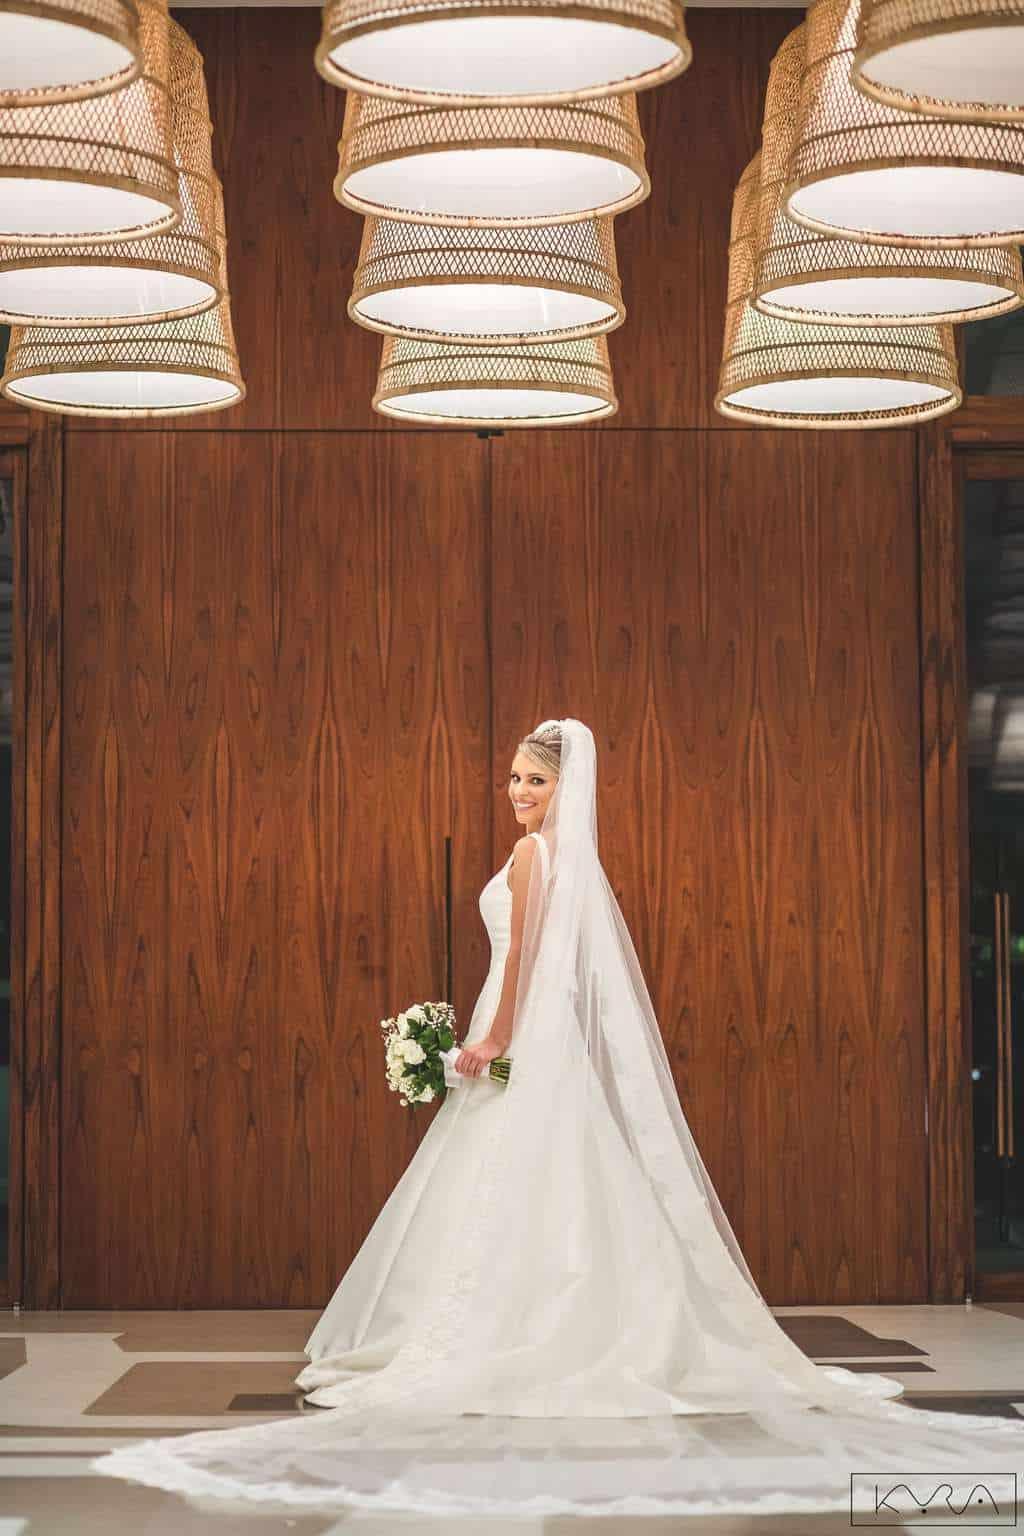 ana-carolina-e-bernardo-Anna-Carolina-Werneck-beleza-da-noiva-casamento-tradicional-Gavea-Golf-Club-Kyra-Mirsky-look-making-of-mini-wedding-noiva-verde-e-rosa-vestido-de-noiva-casamento-52